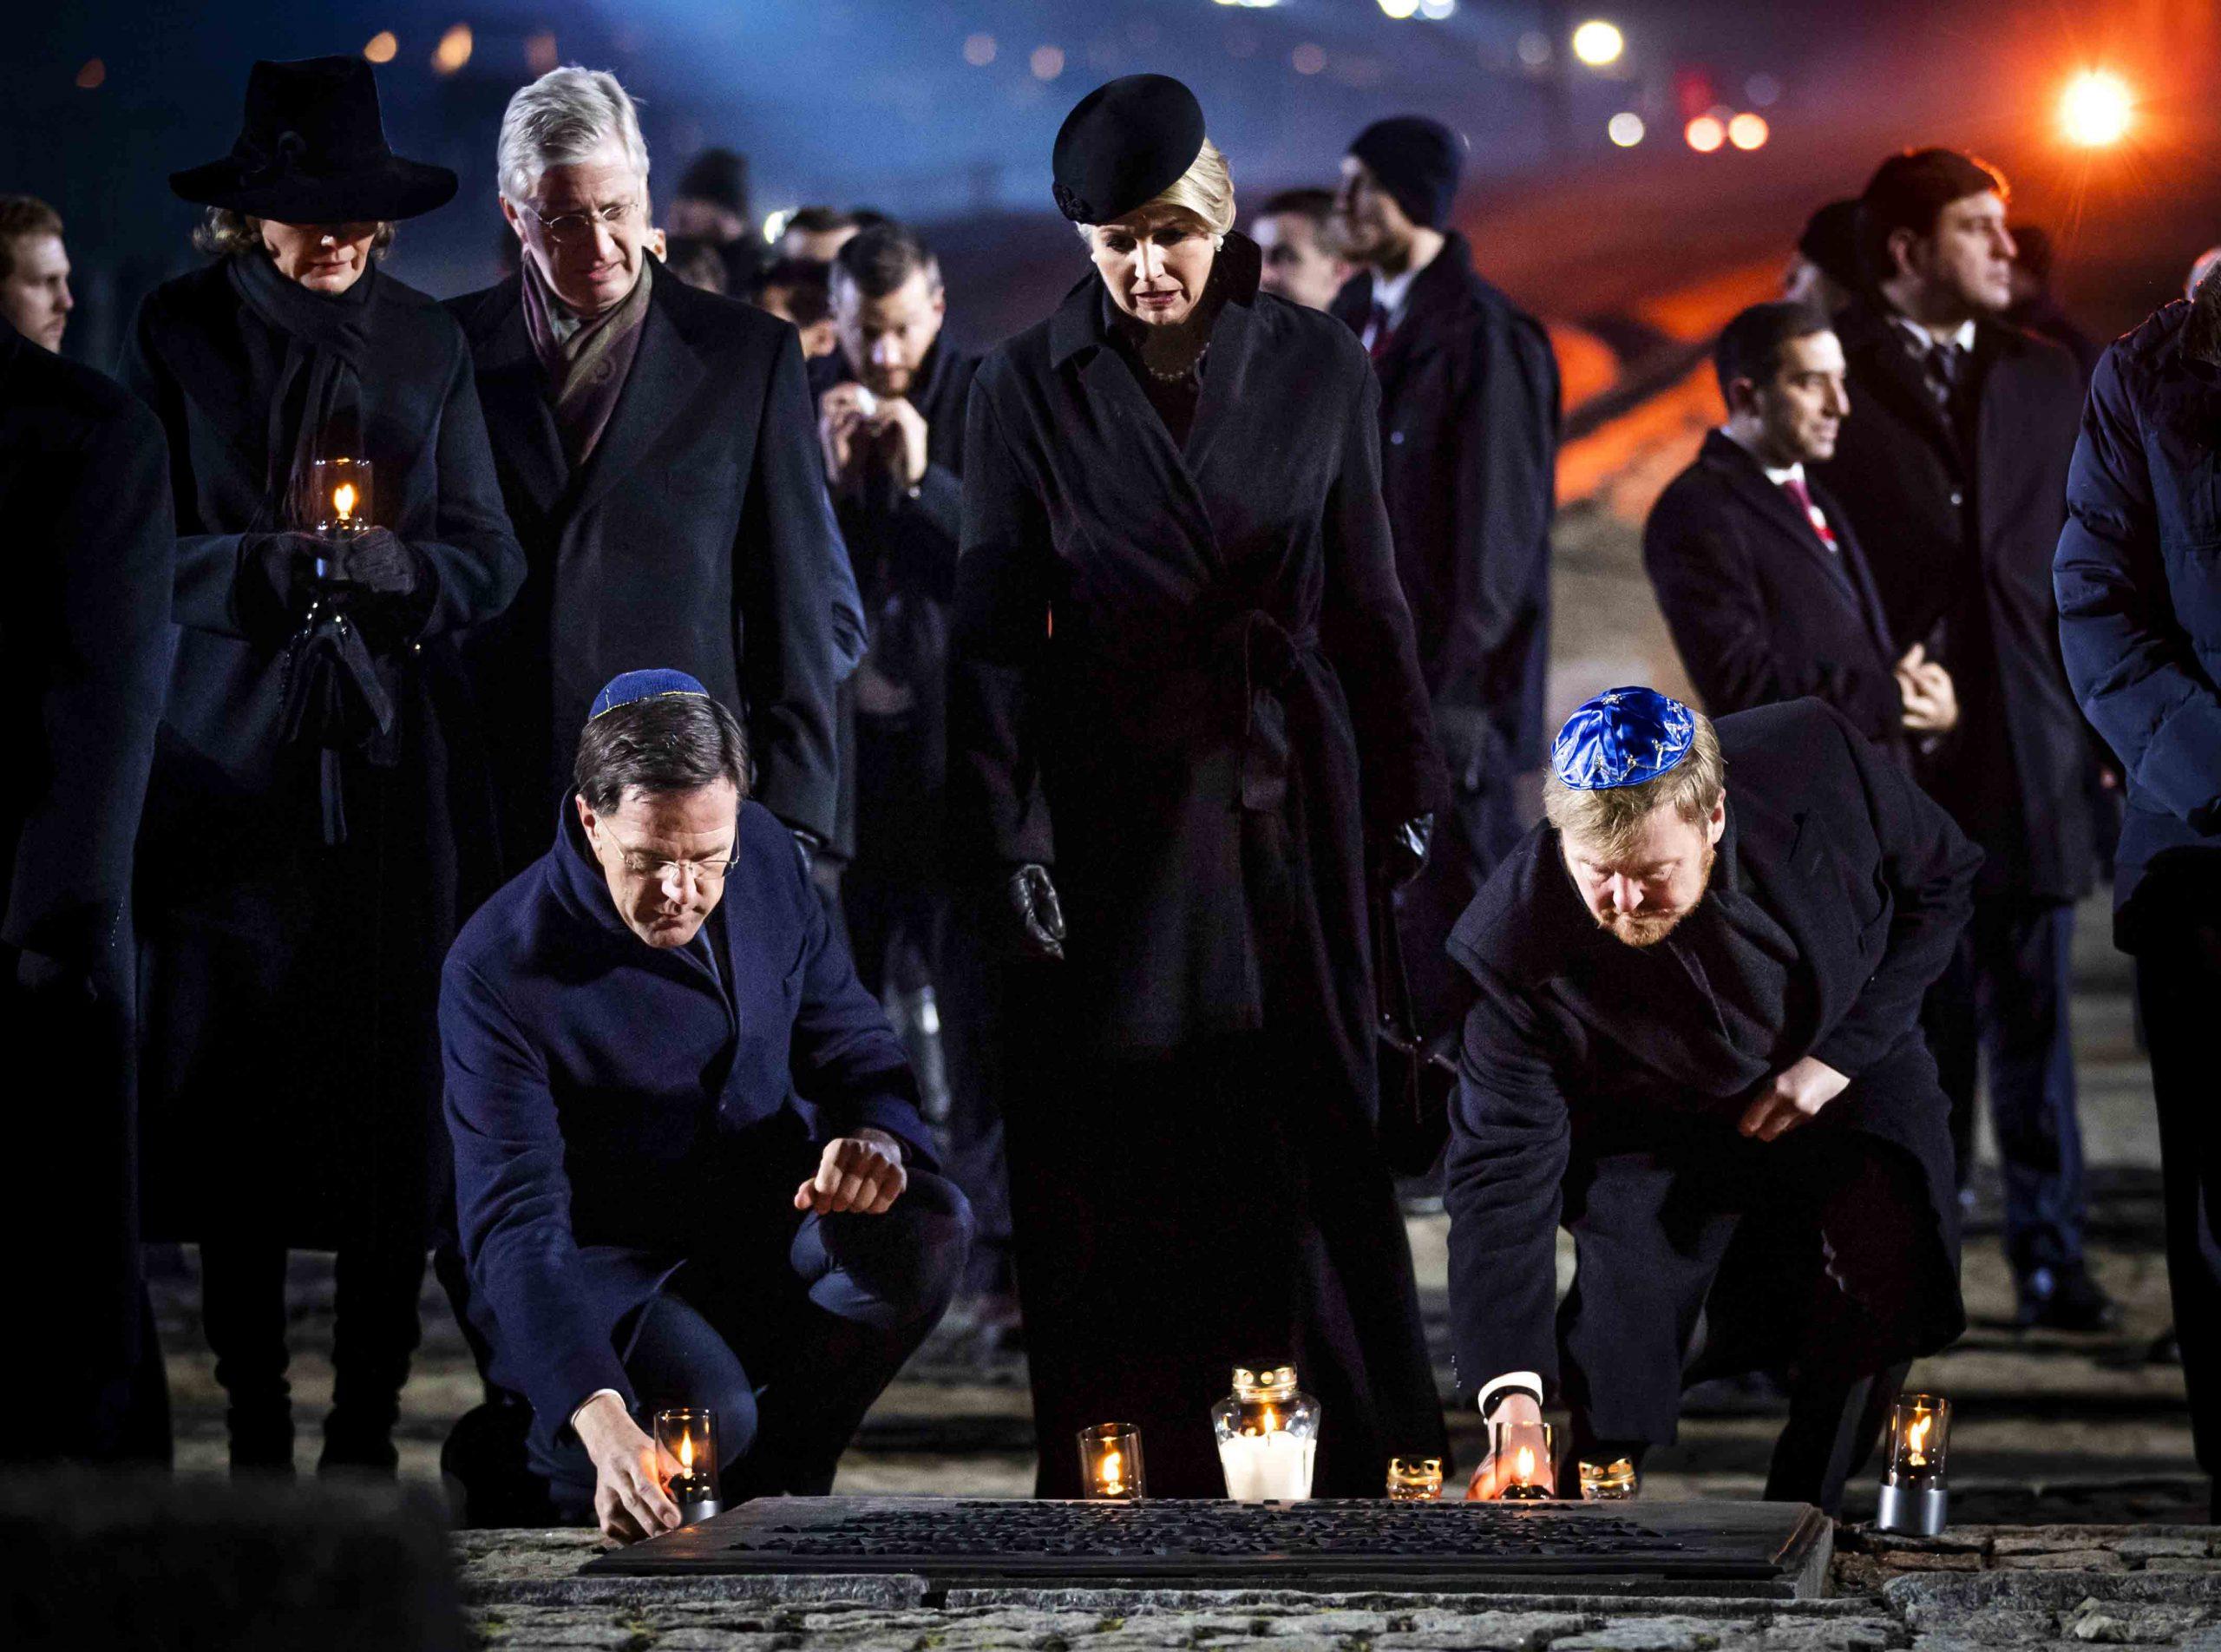 koning-willem-alexander-premier-rutte-koningin-maxima-in-auschwitz-75-jaar-vrijheid-herdenking-polen